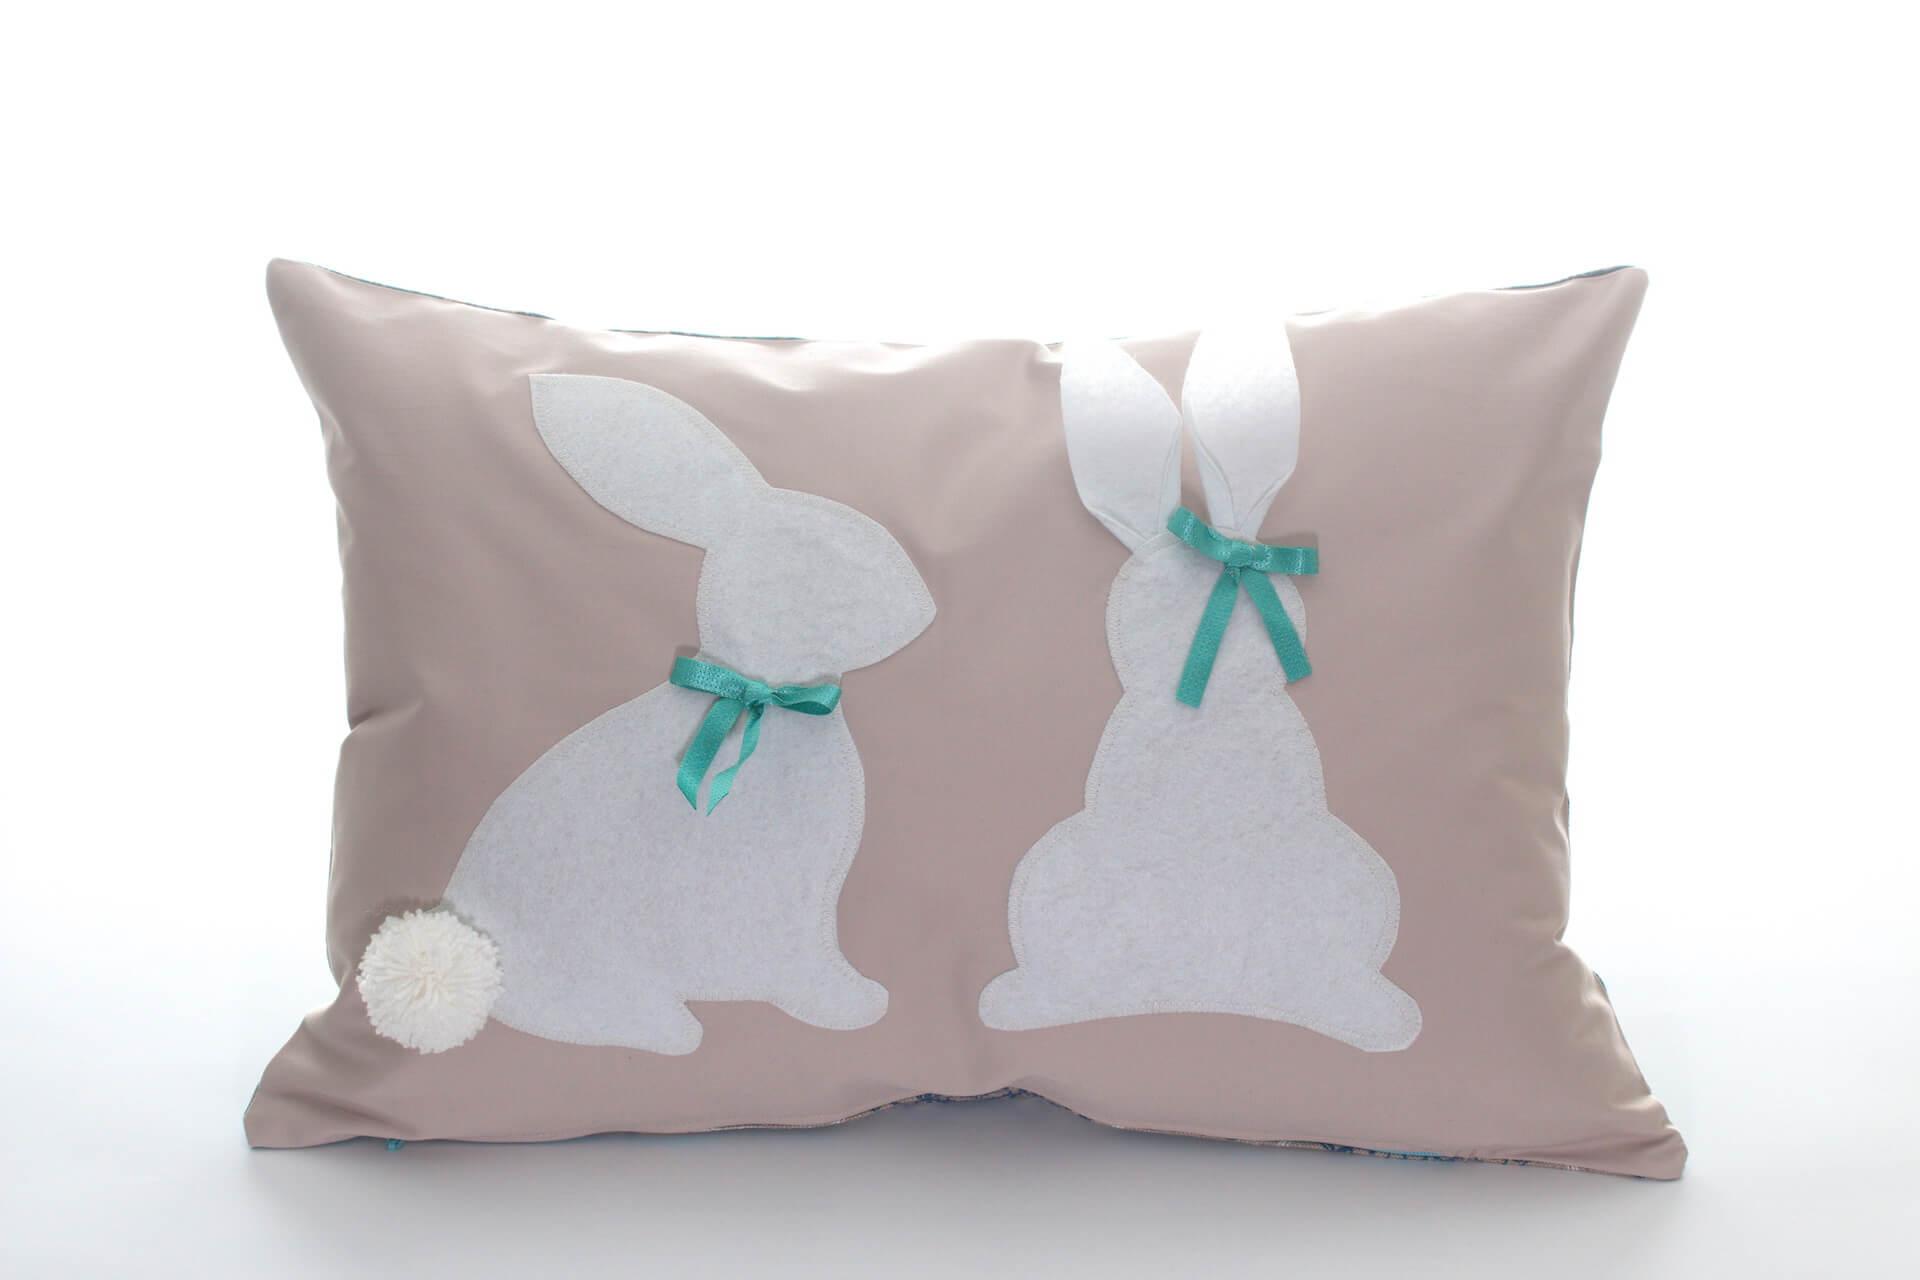 cream colored sofa pillows no sew slipcovers handmade decorative pillow with white